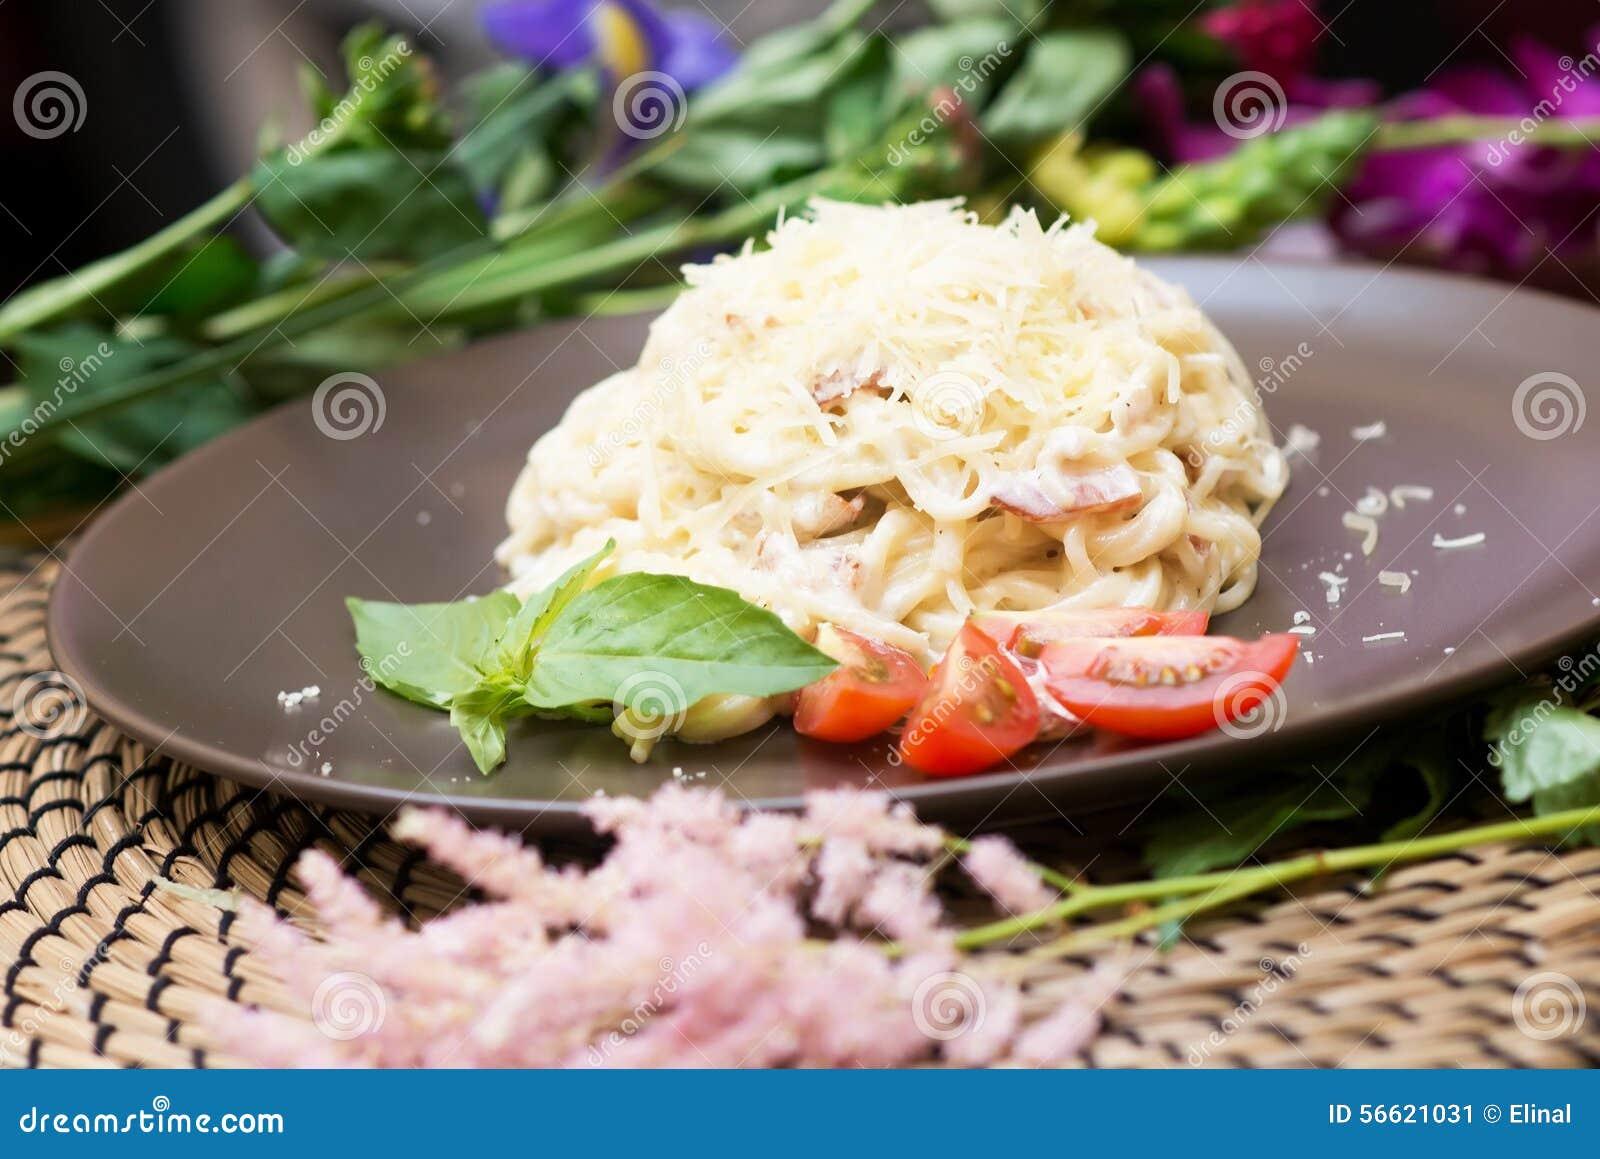 Carbonara de p tes cuisine italienne traditionnelle - Cuisine italienne pates ...